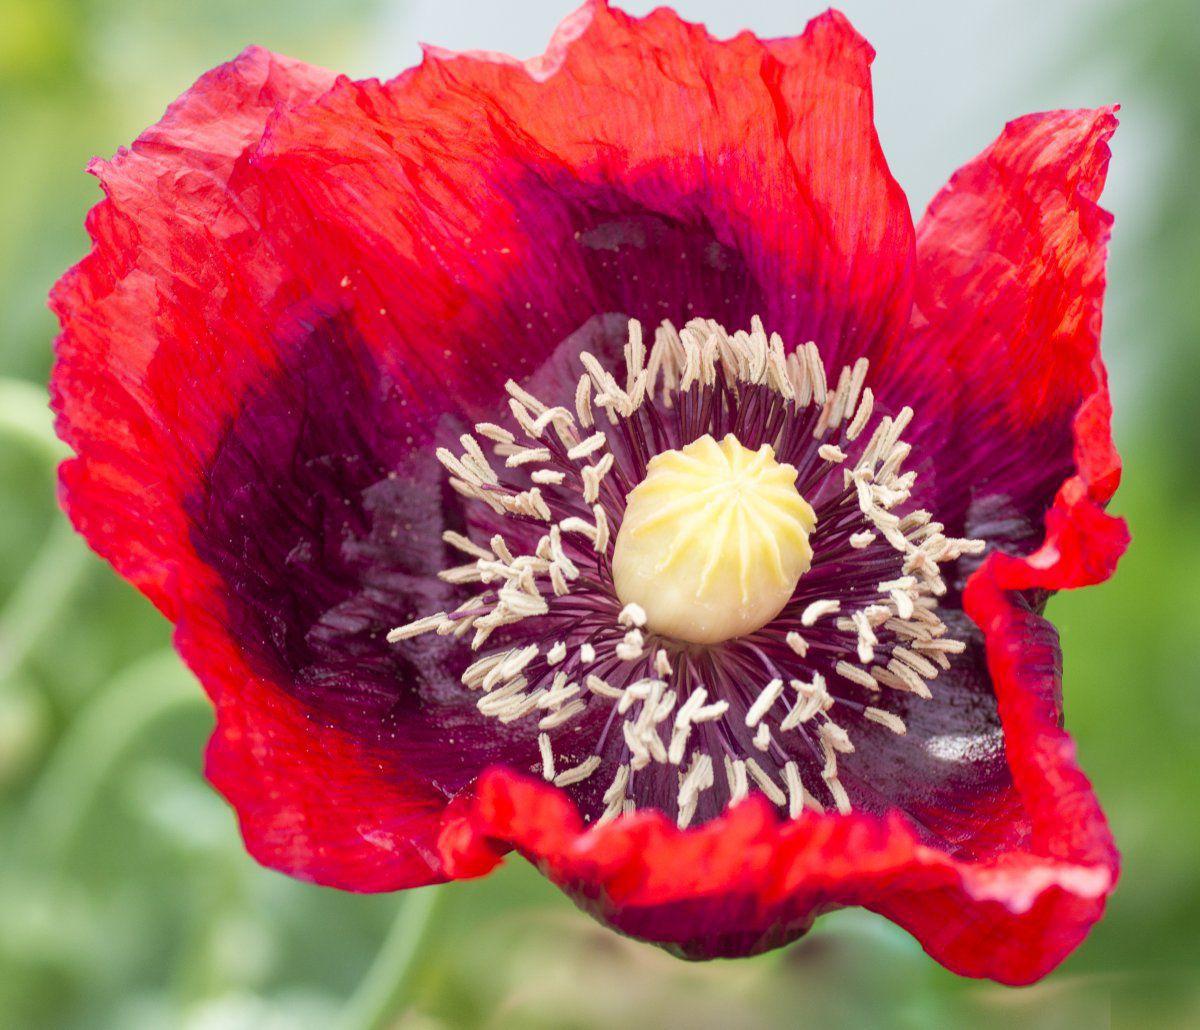 2016-06-23 Papaver hybridum 'Raspberry Breadseed Poppy' (close-up).jpg